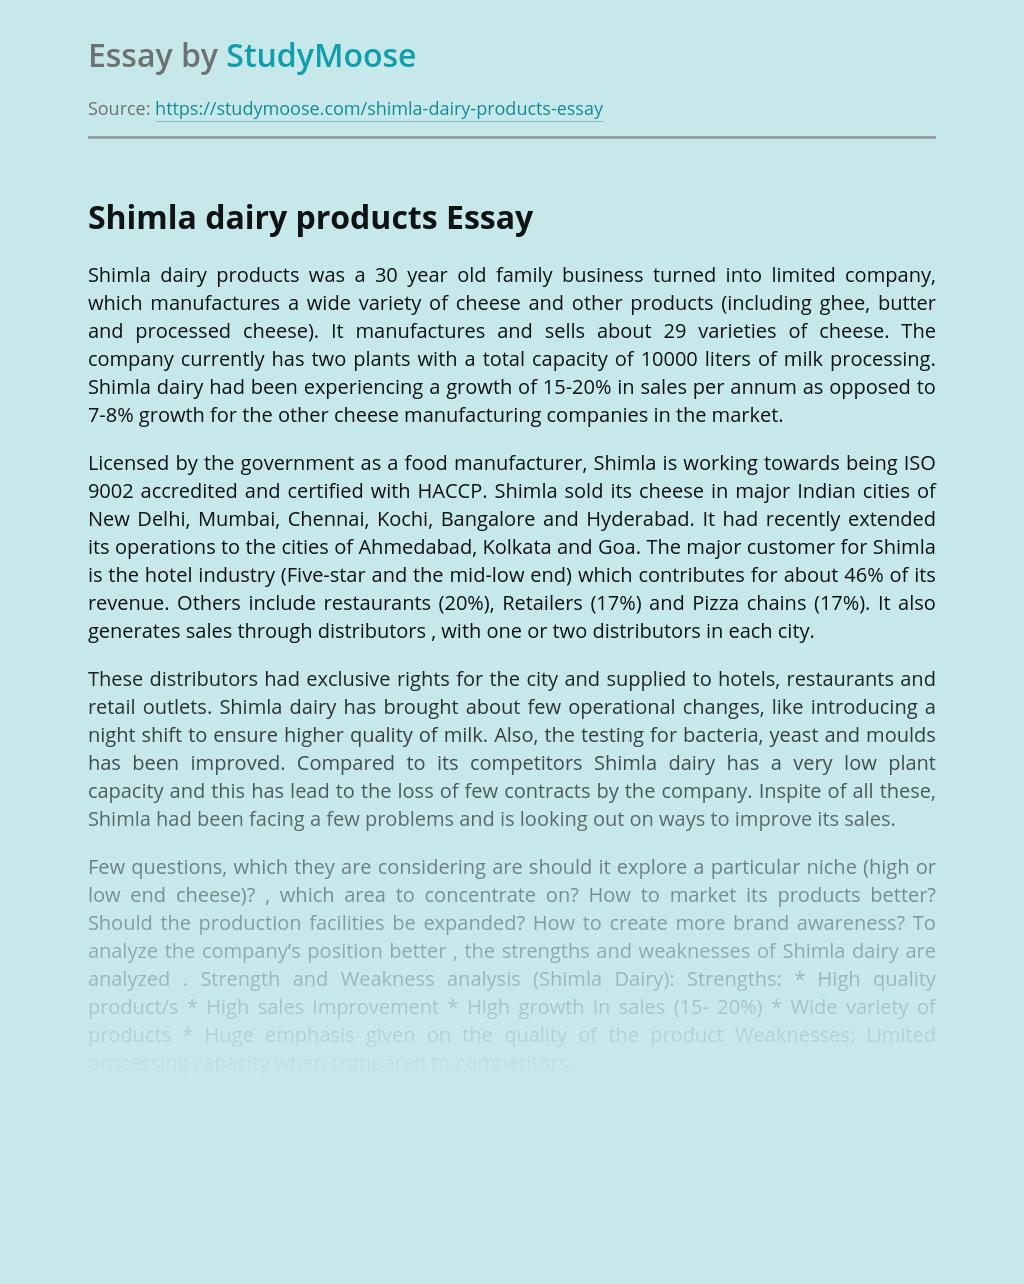 Shimla Dairy Business